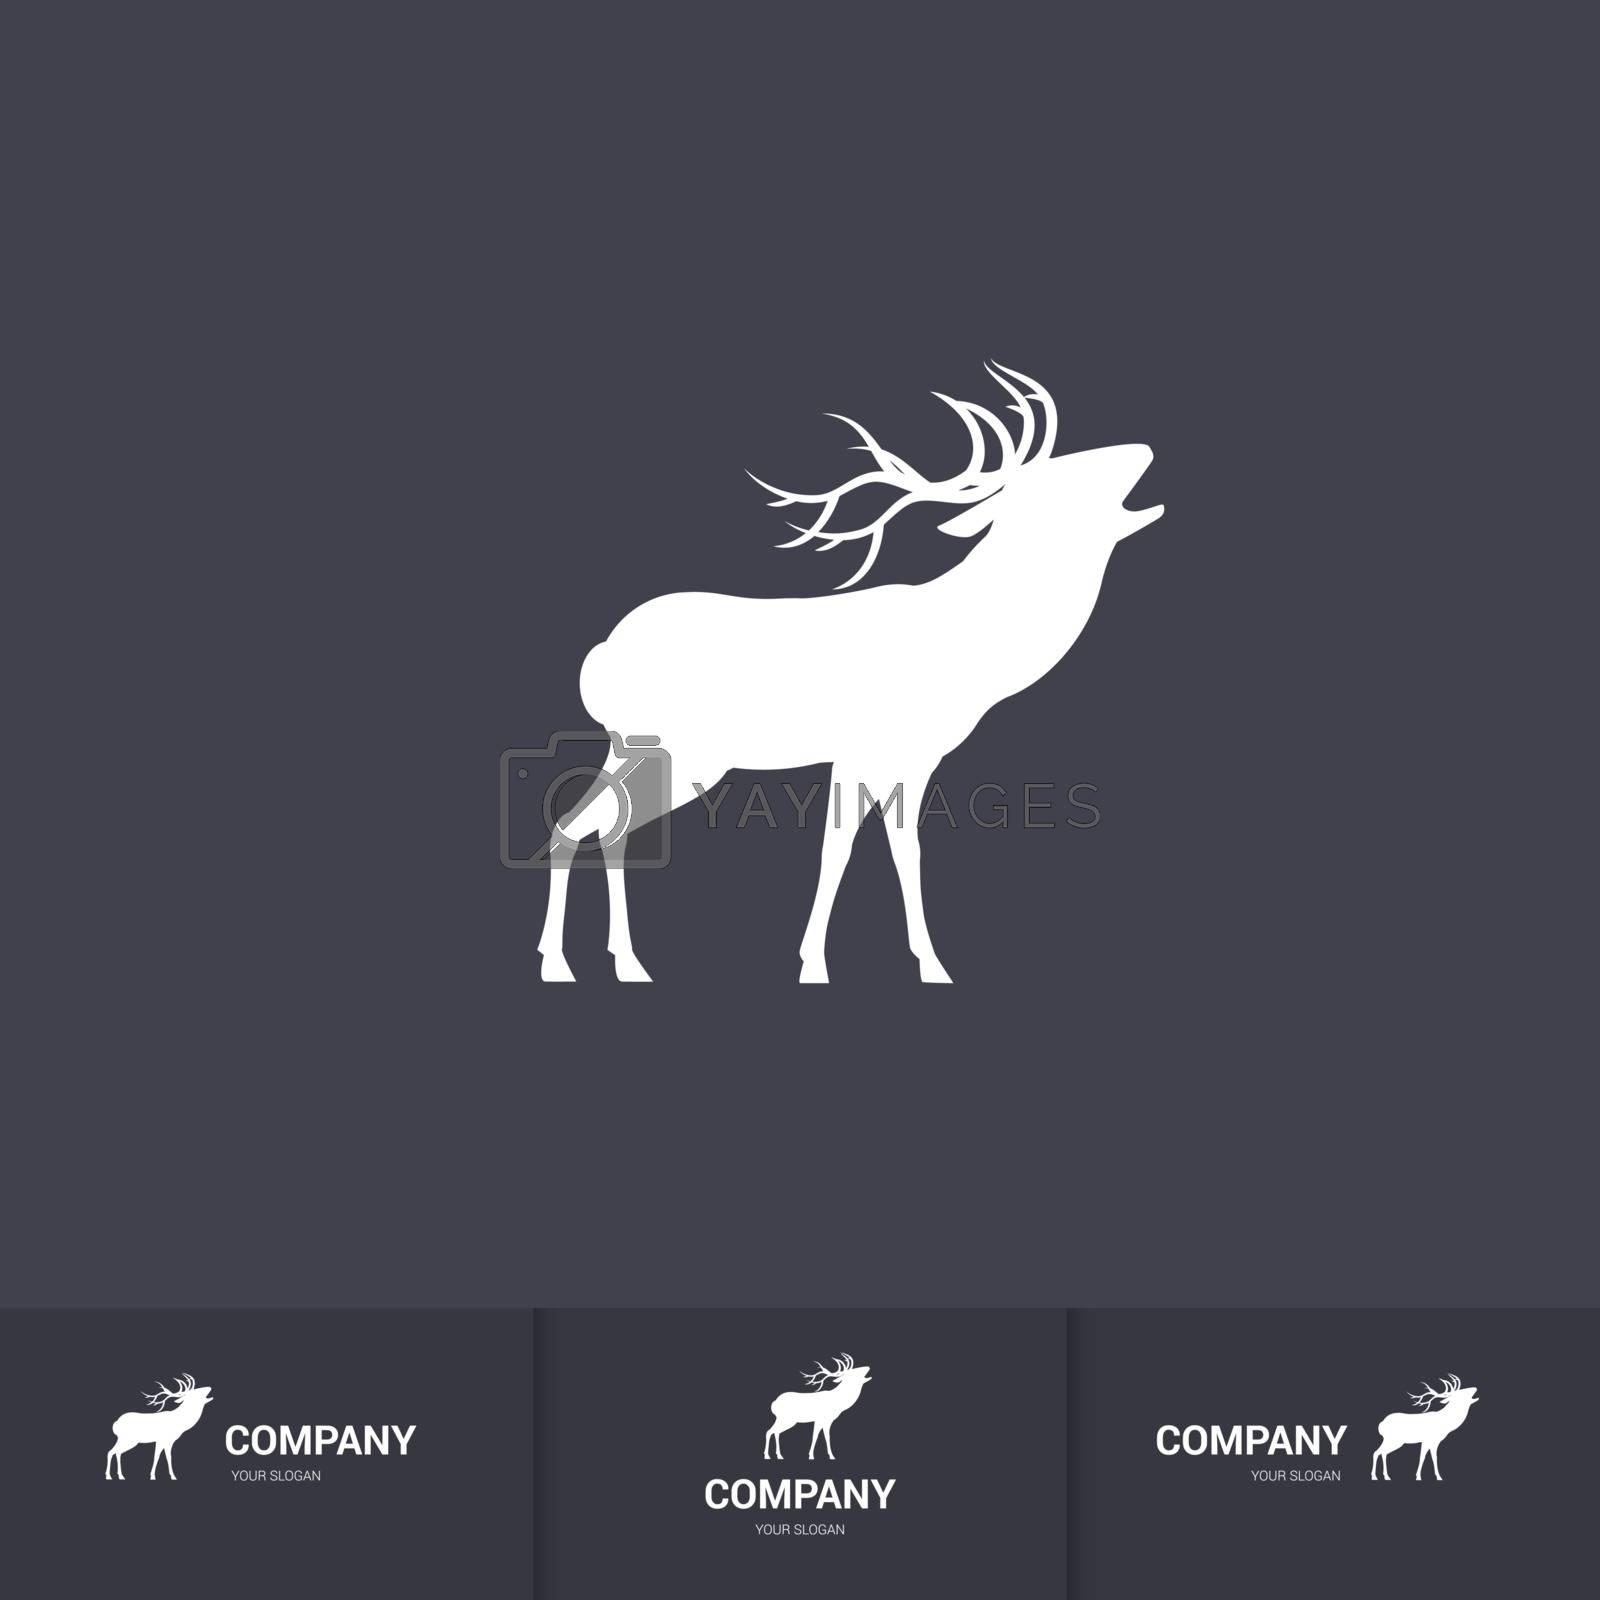 Simple Roaring Horned Deer Silhouette for Mascot Logo Template on Dark Background